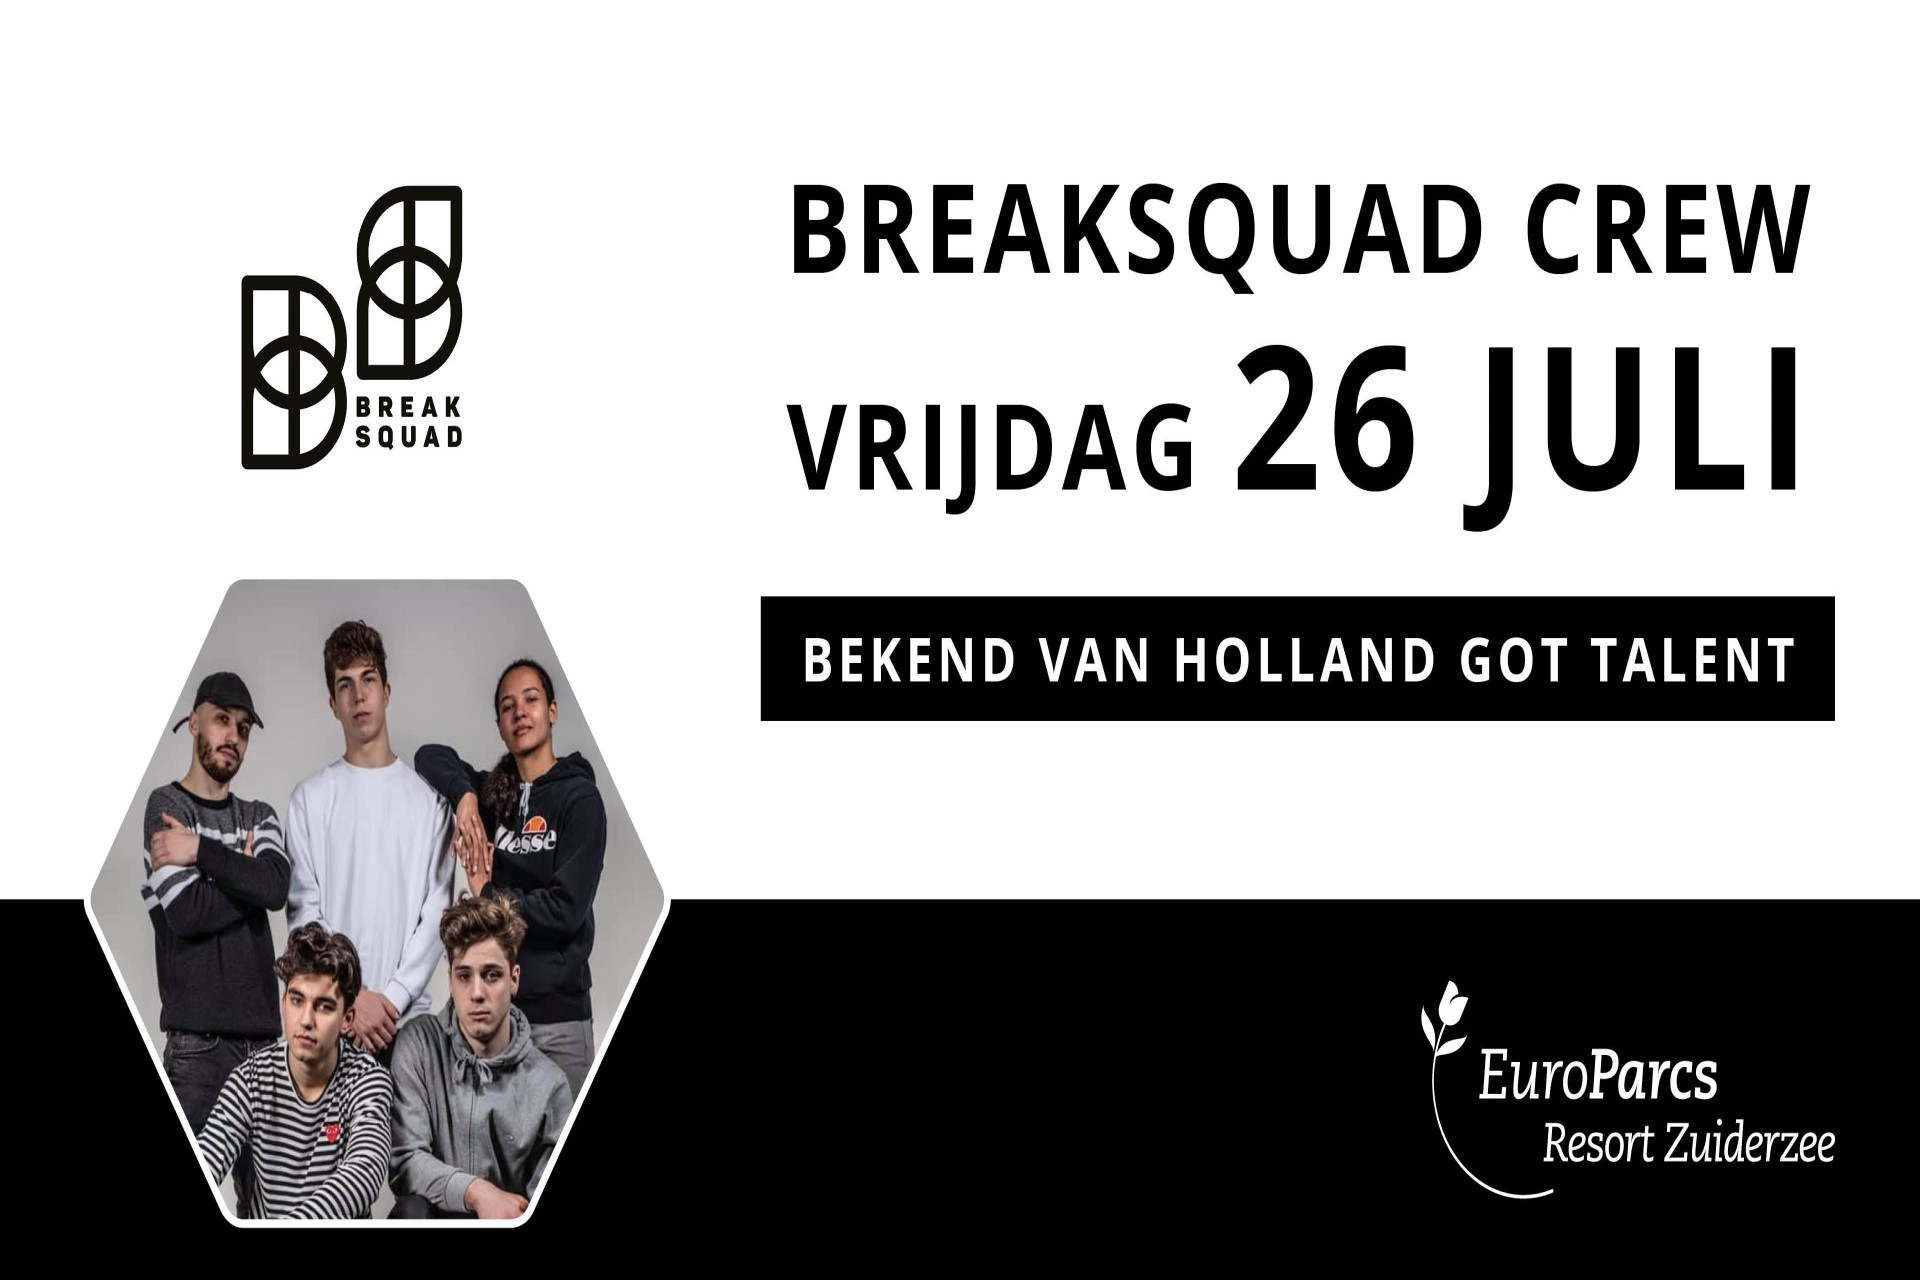 Breaksquad Crew